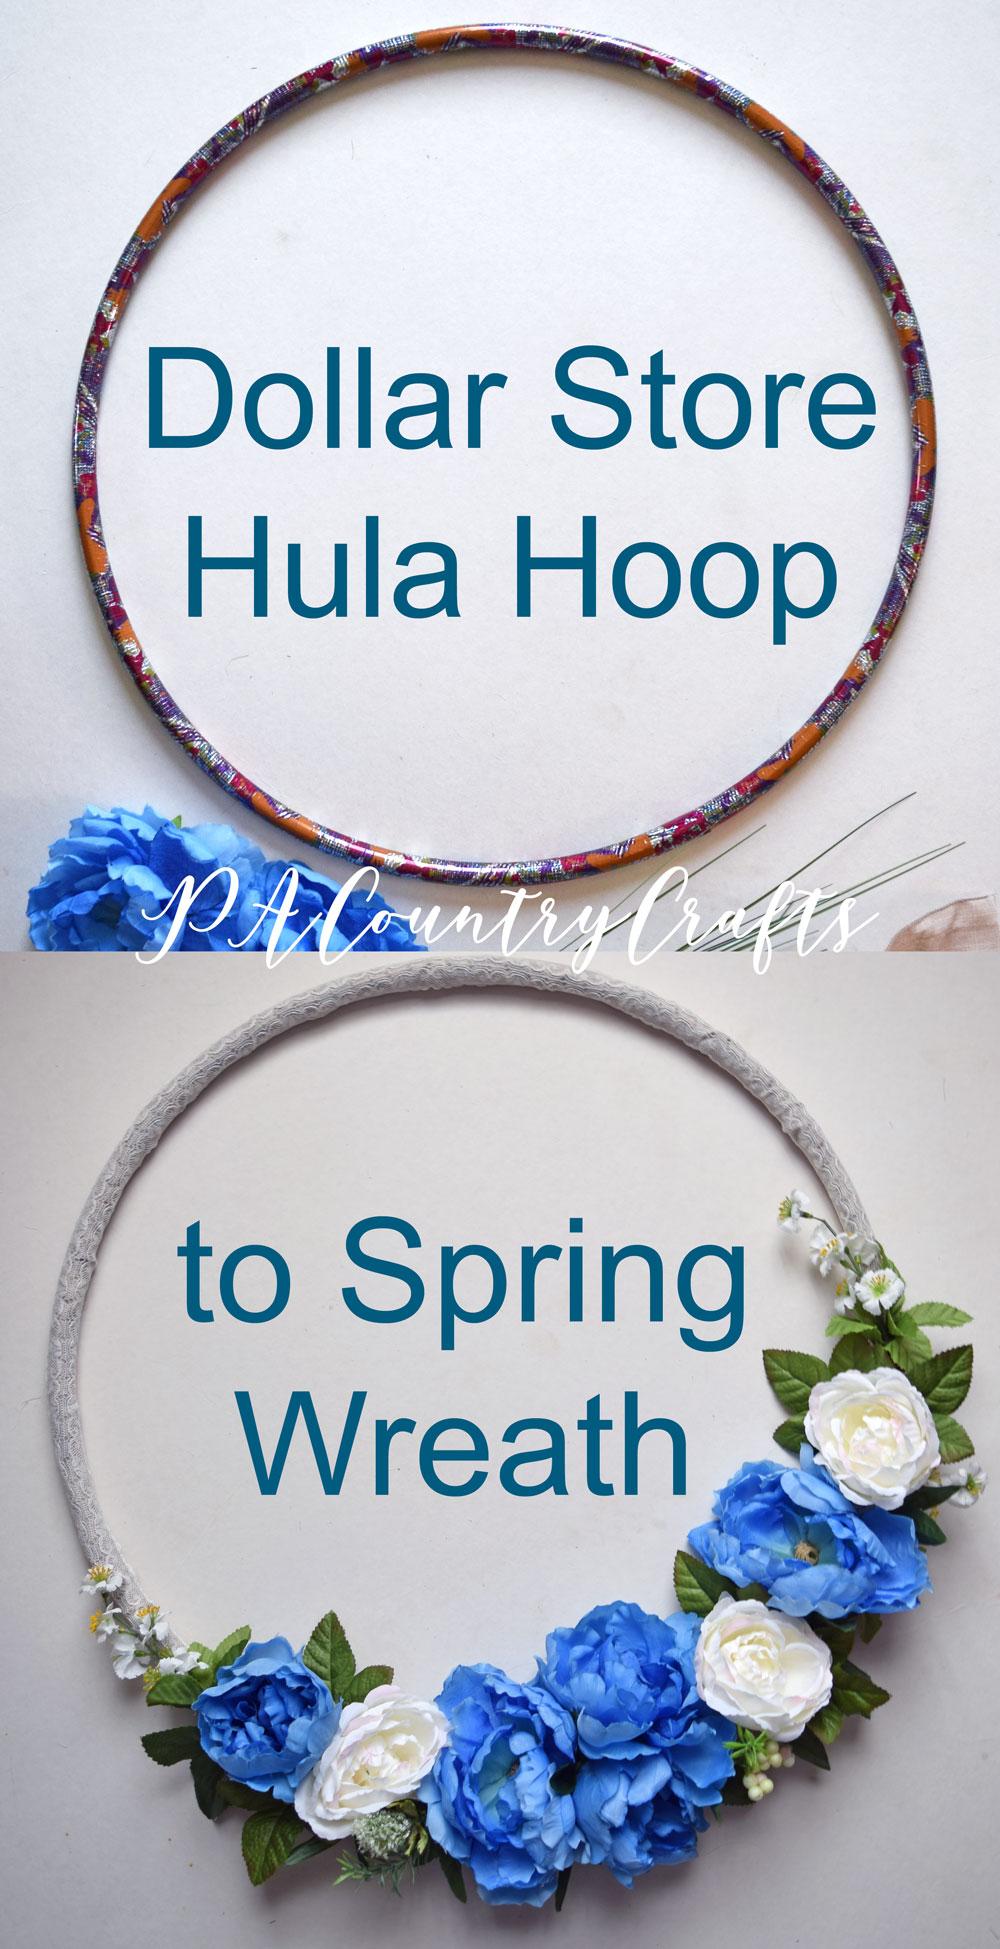 Dollar Store Hula Hoop to Spring Wreath